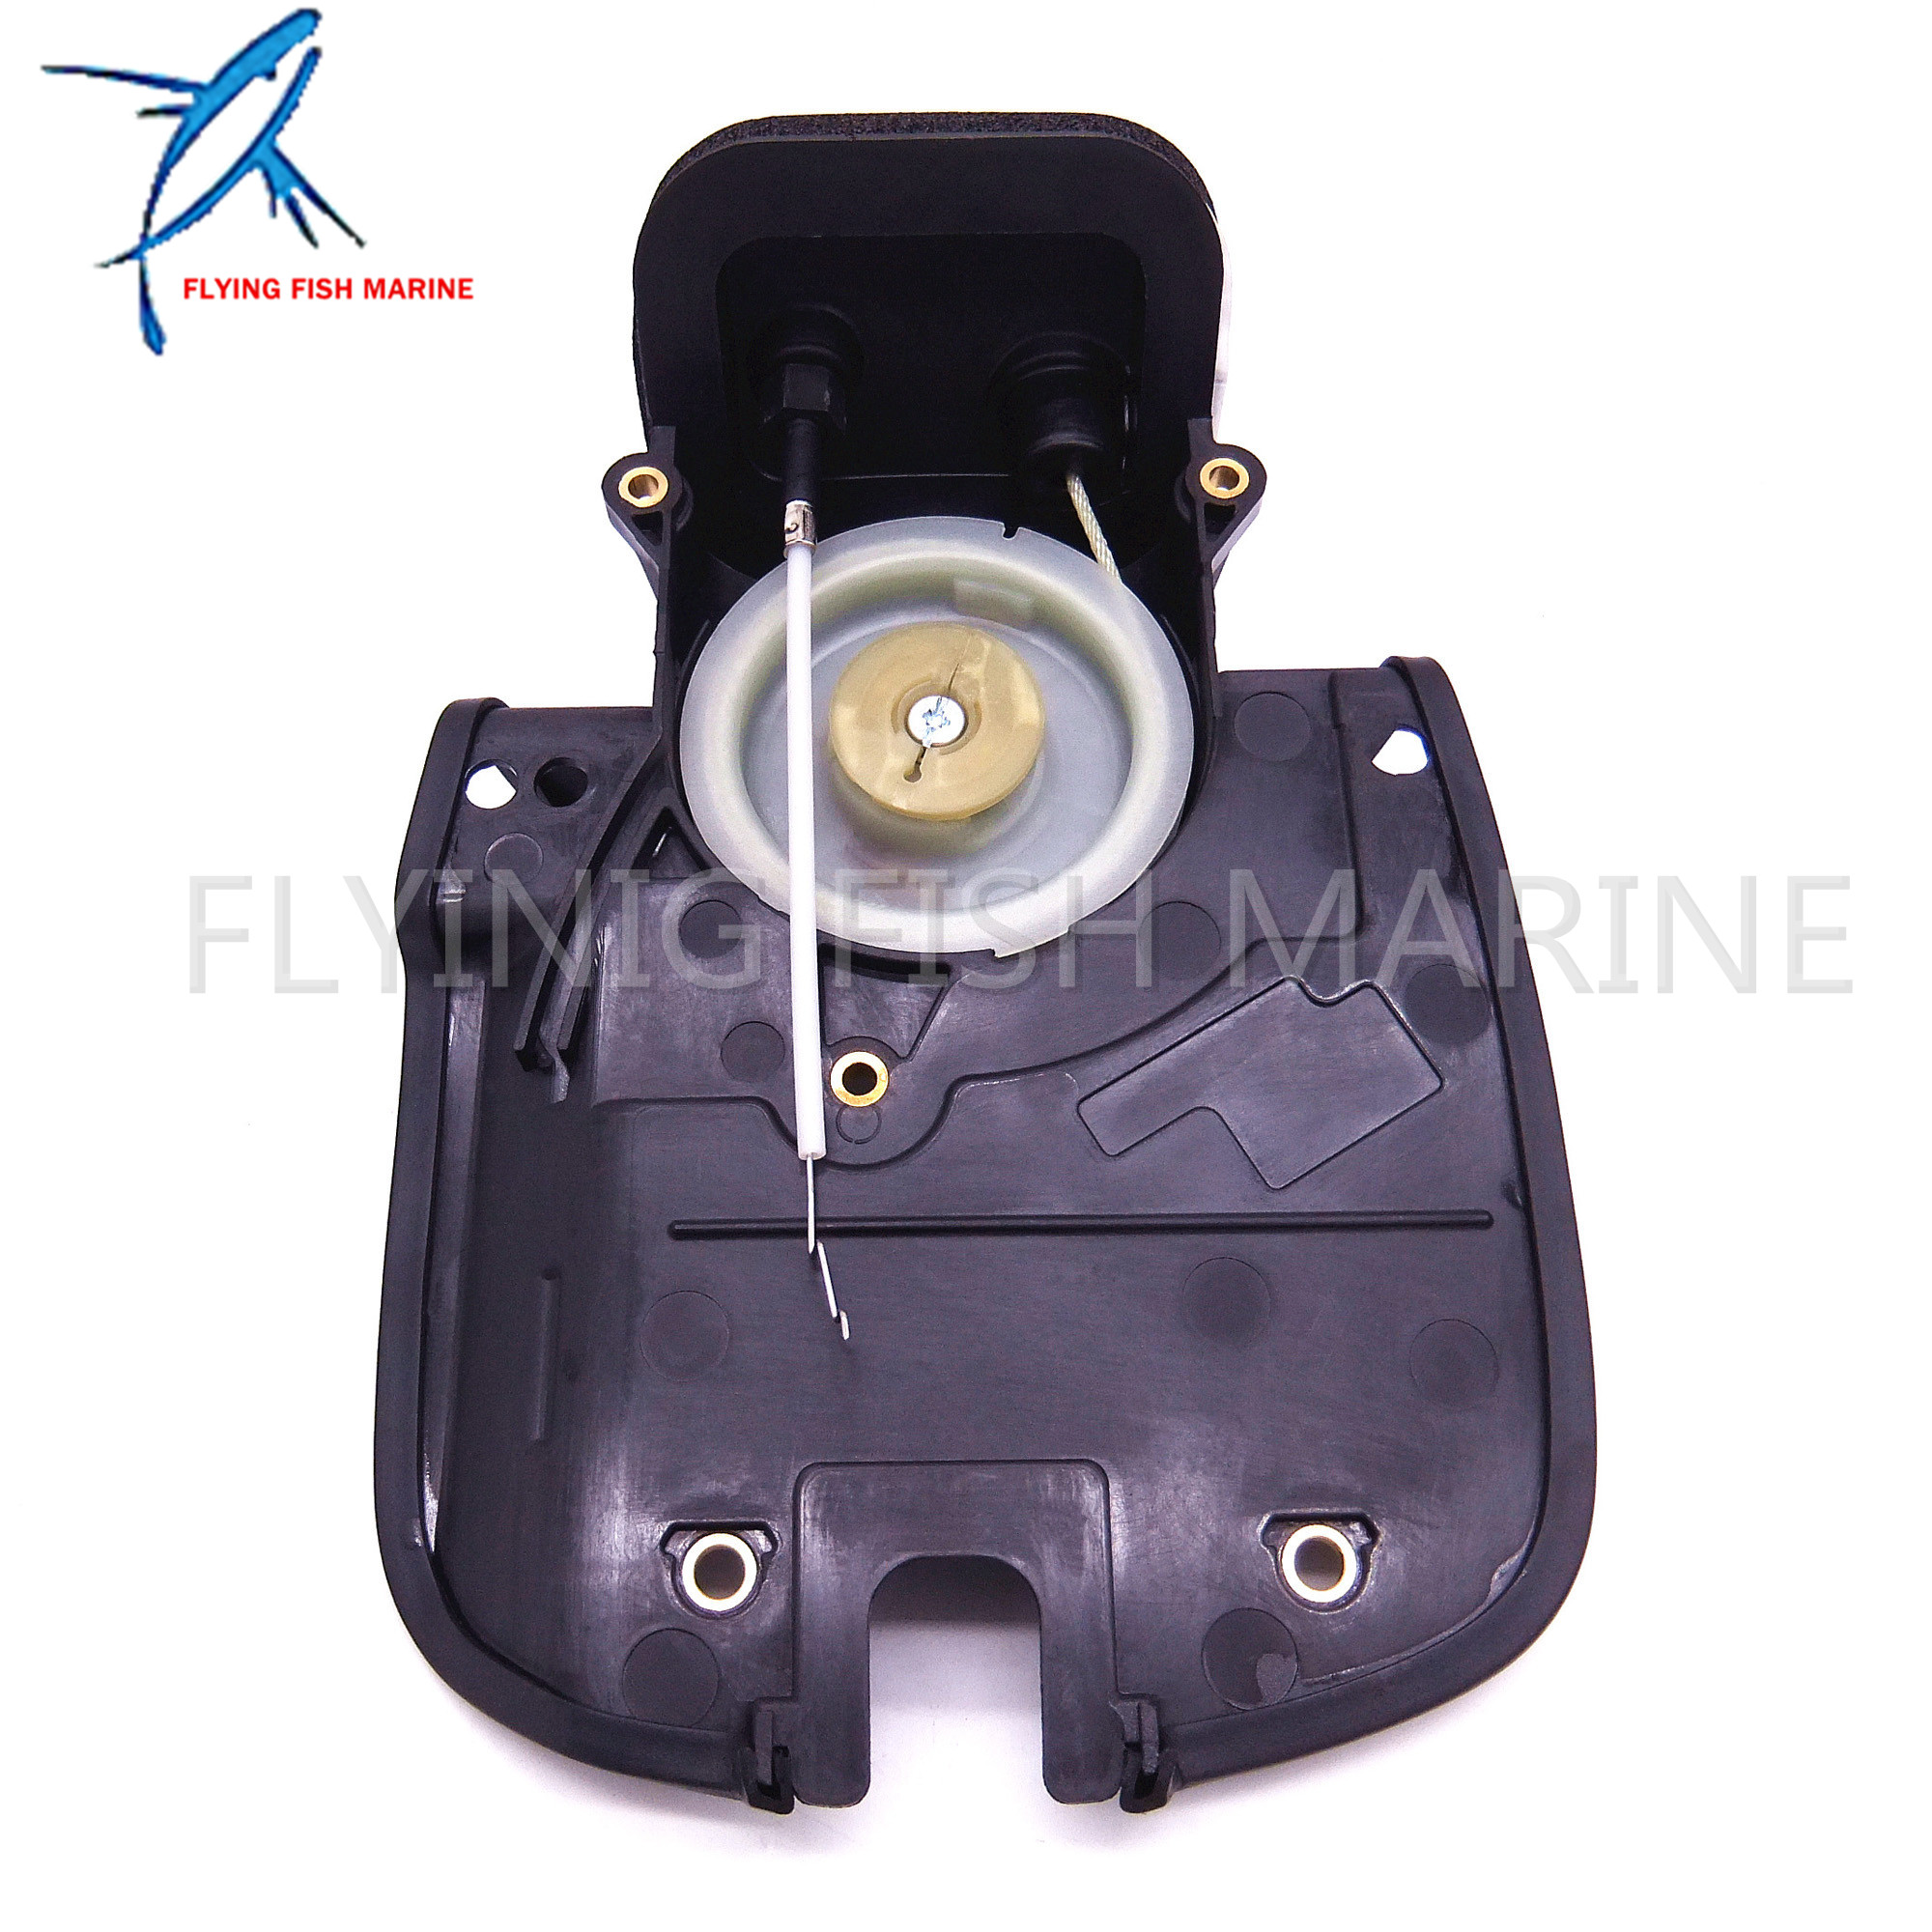 Starter Assy F2 6 04070000 for Parsun HDX F2 6 4 stroke Outboard Motors